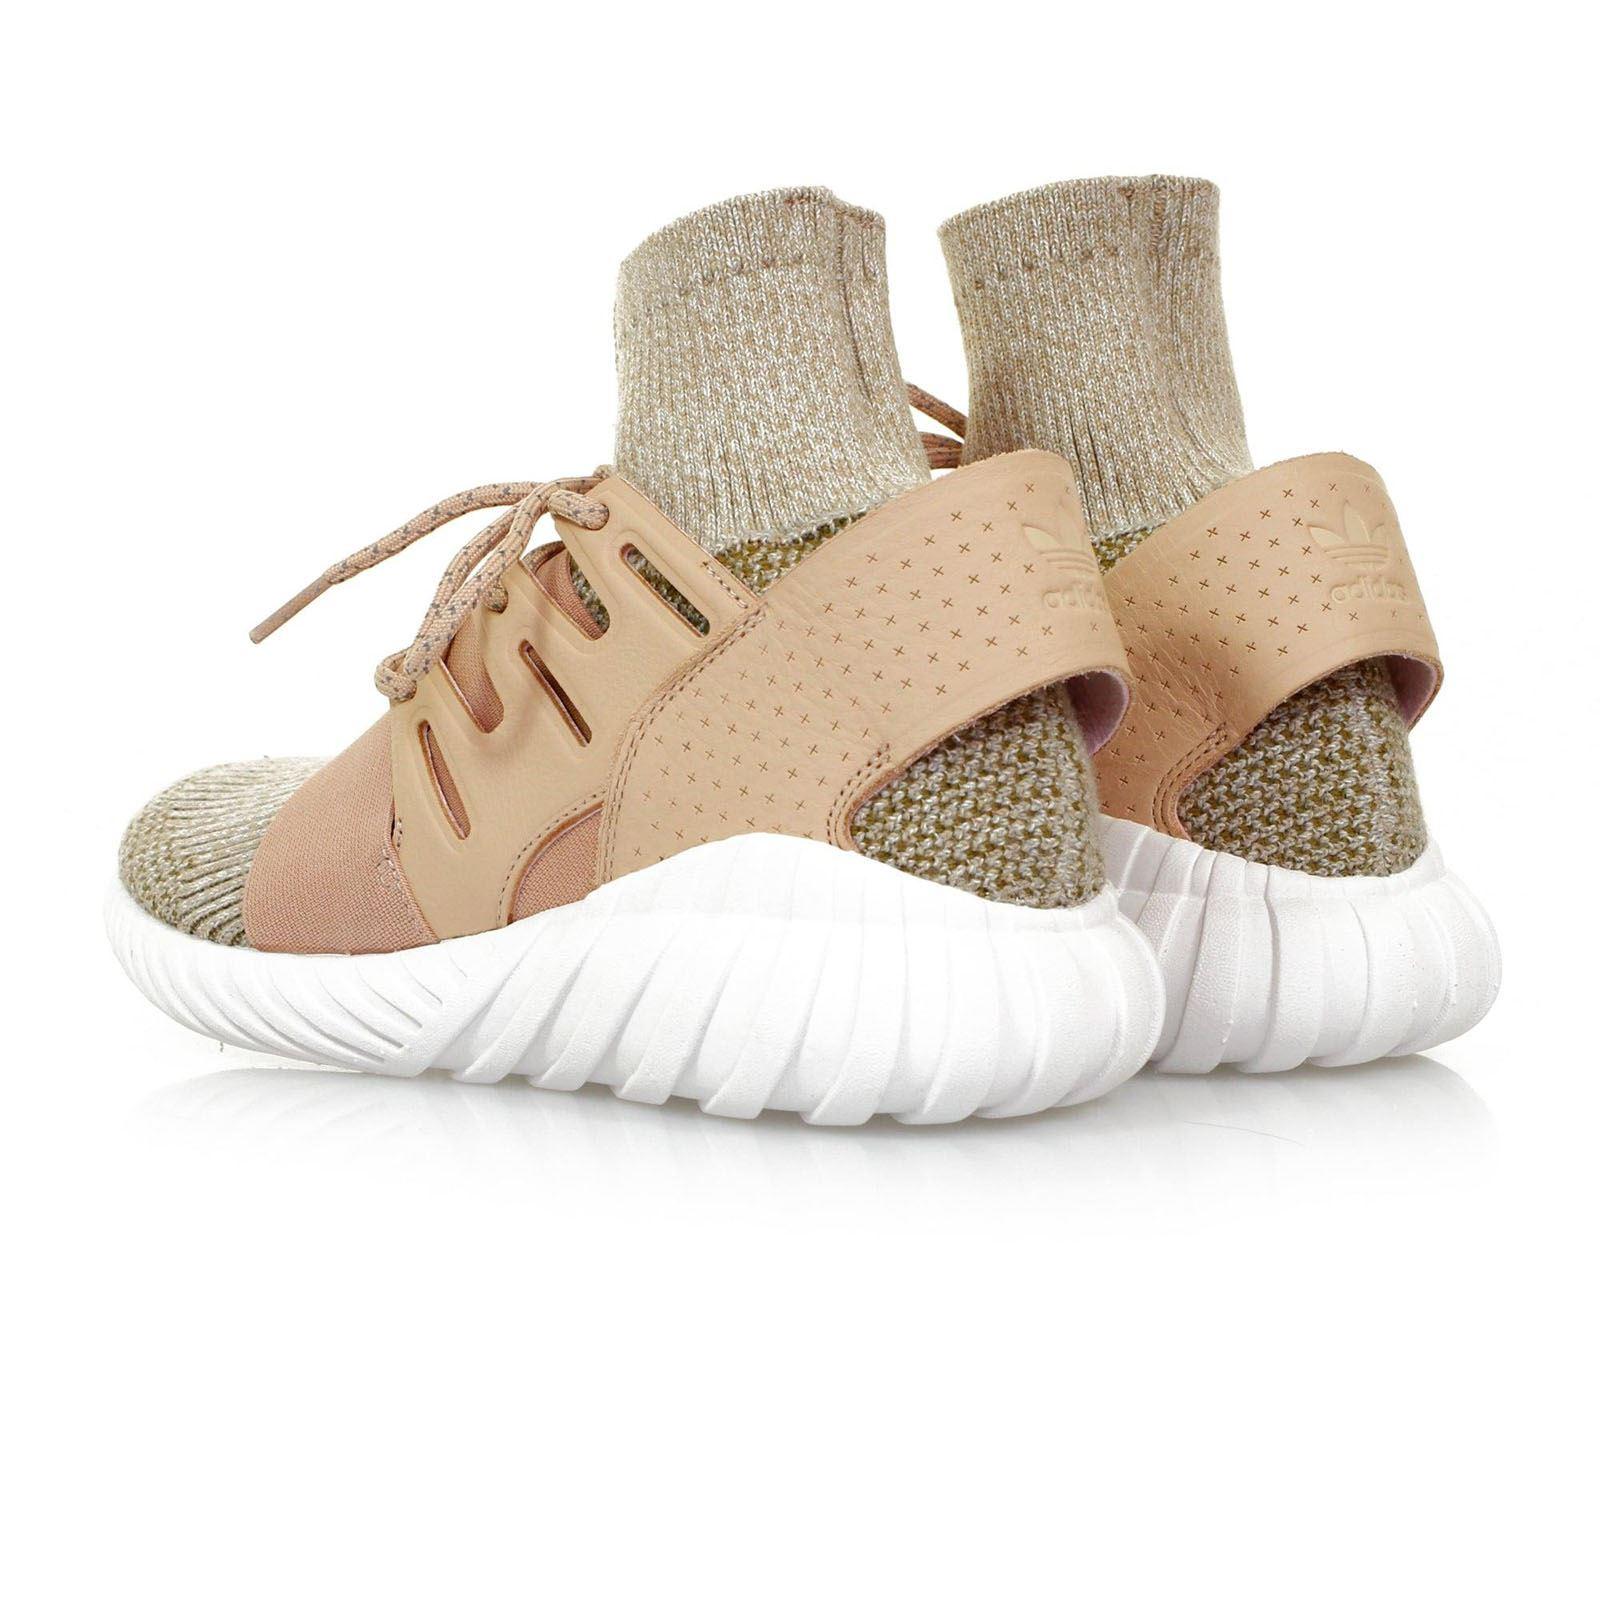 adidas Tubular Doom 12 Mens Trainers~Boots~Originals~Primeknit~UK 3.5 to 12 Doom Only 08caf6